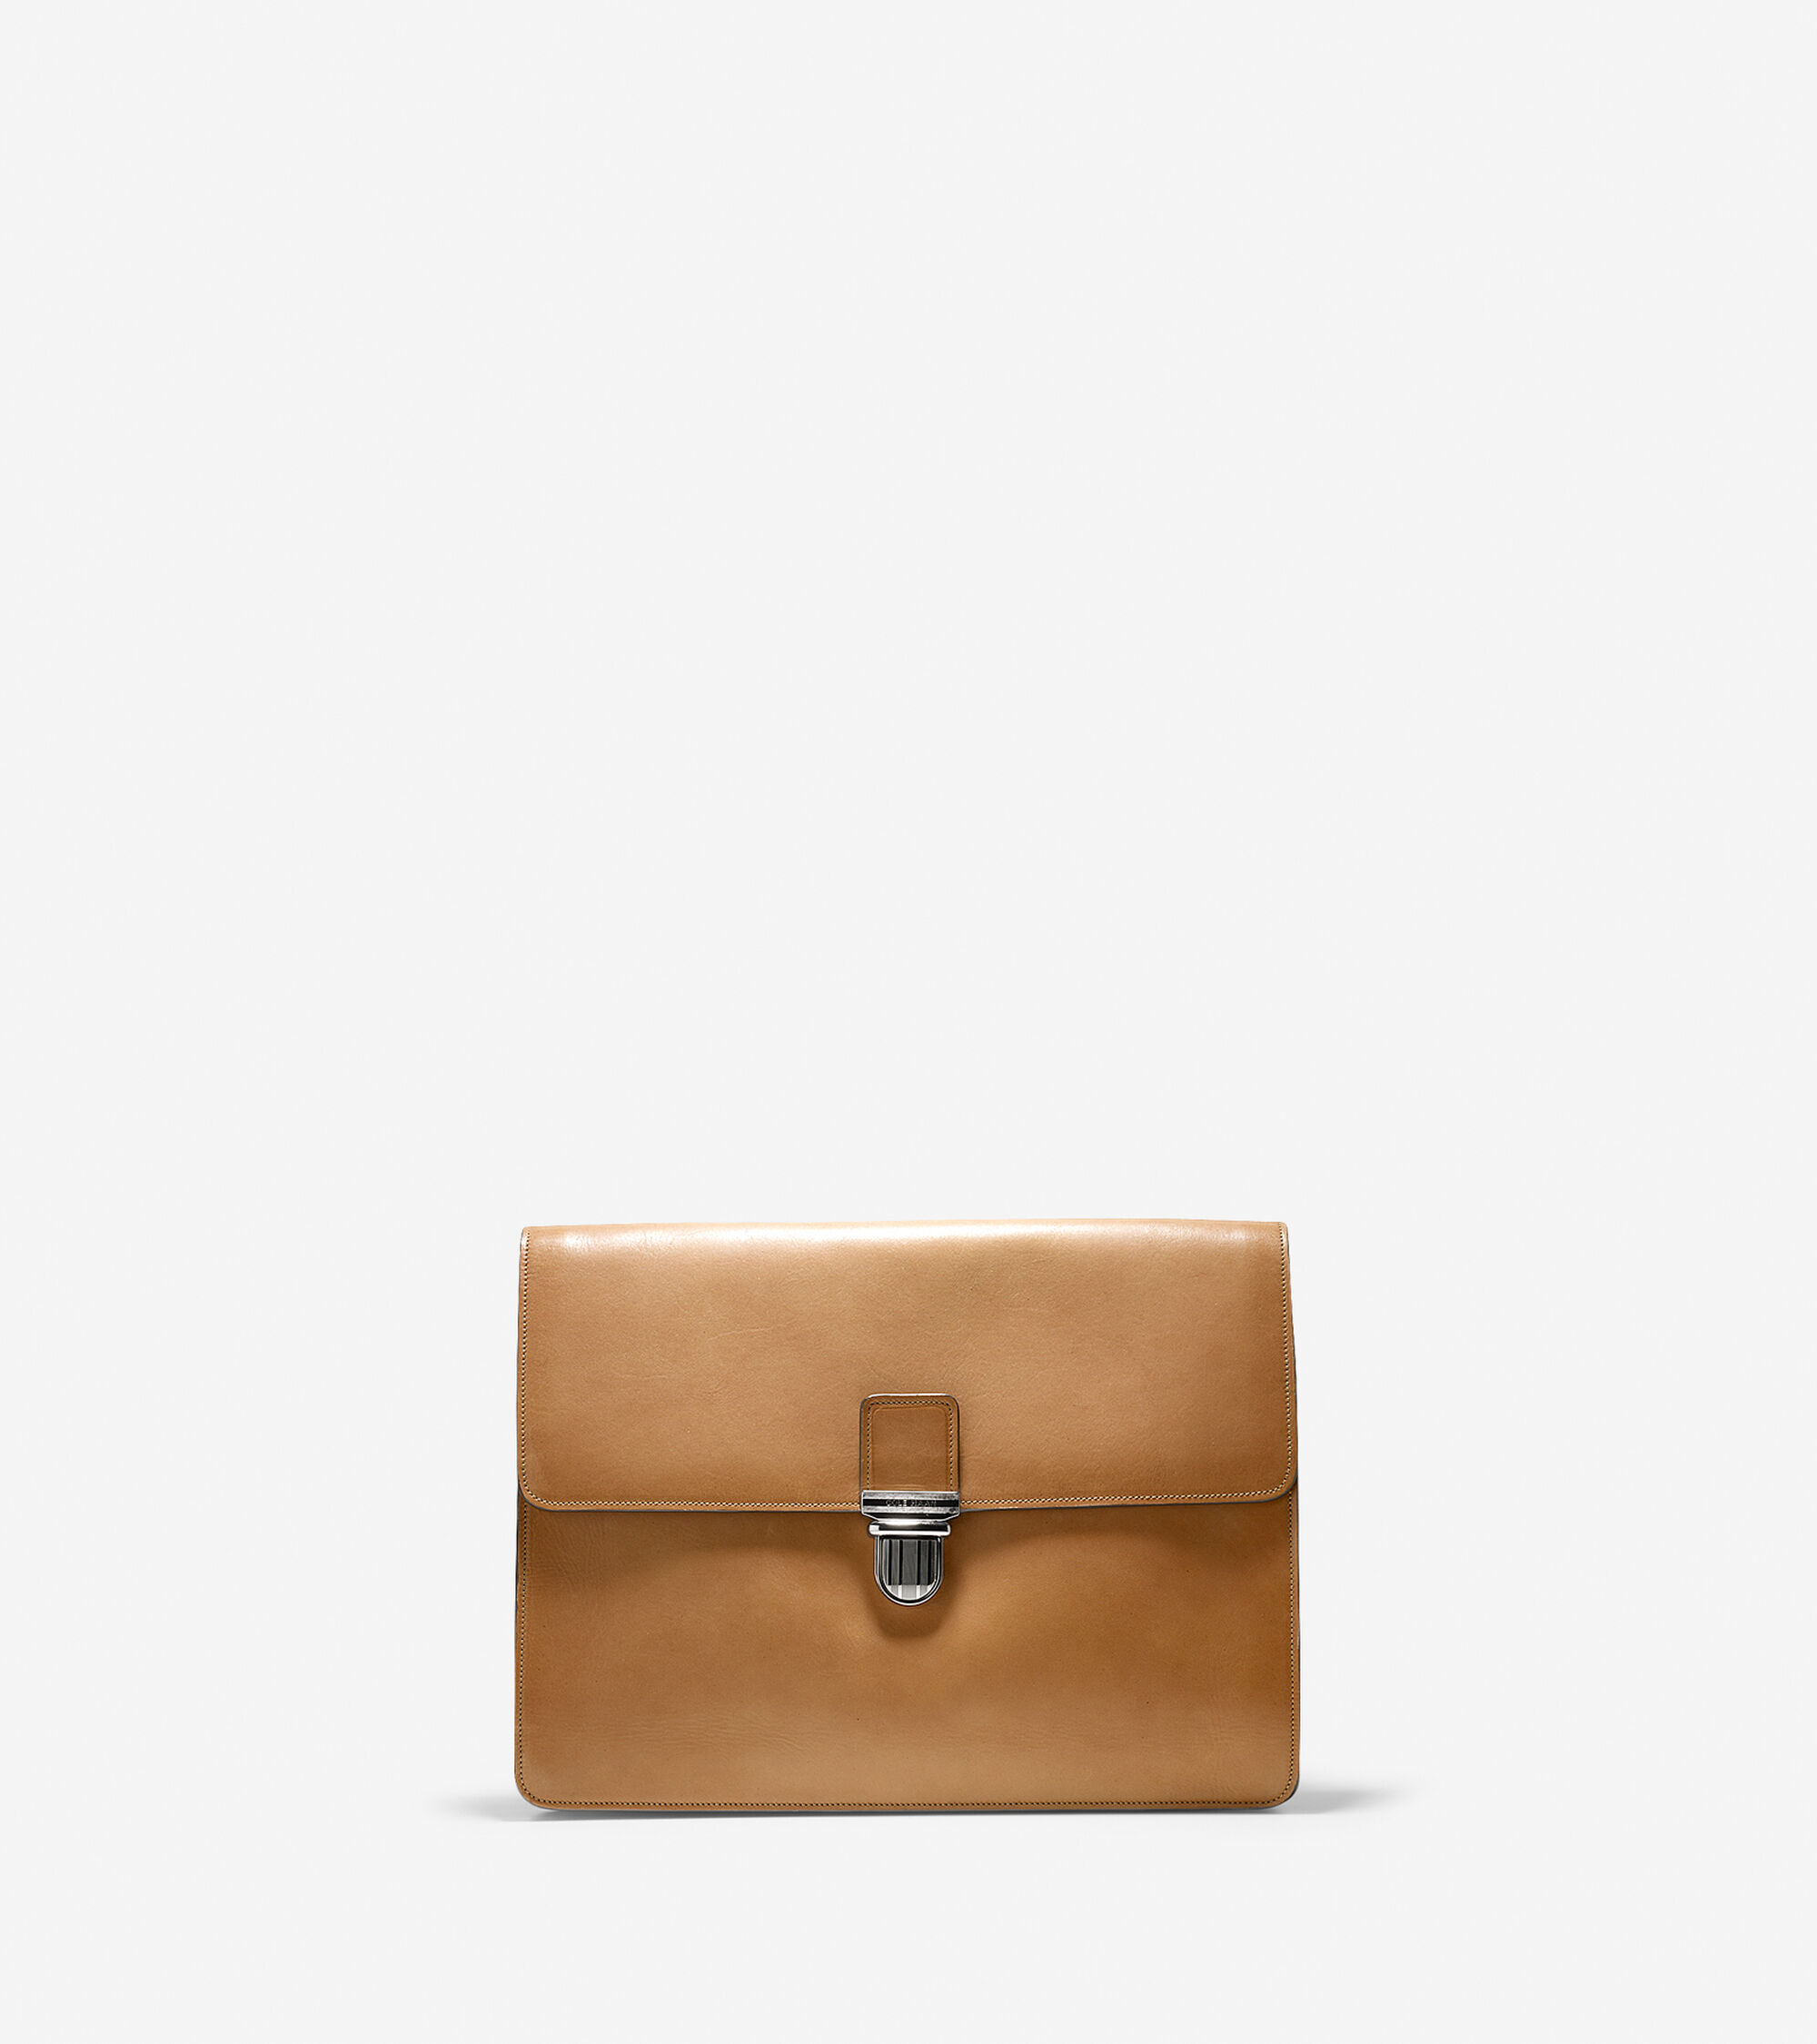 Accessories > Whitman Leather Small Portfolio